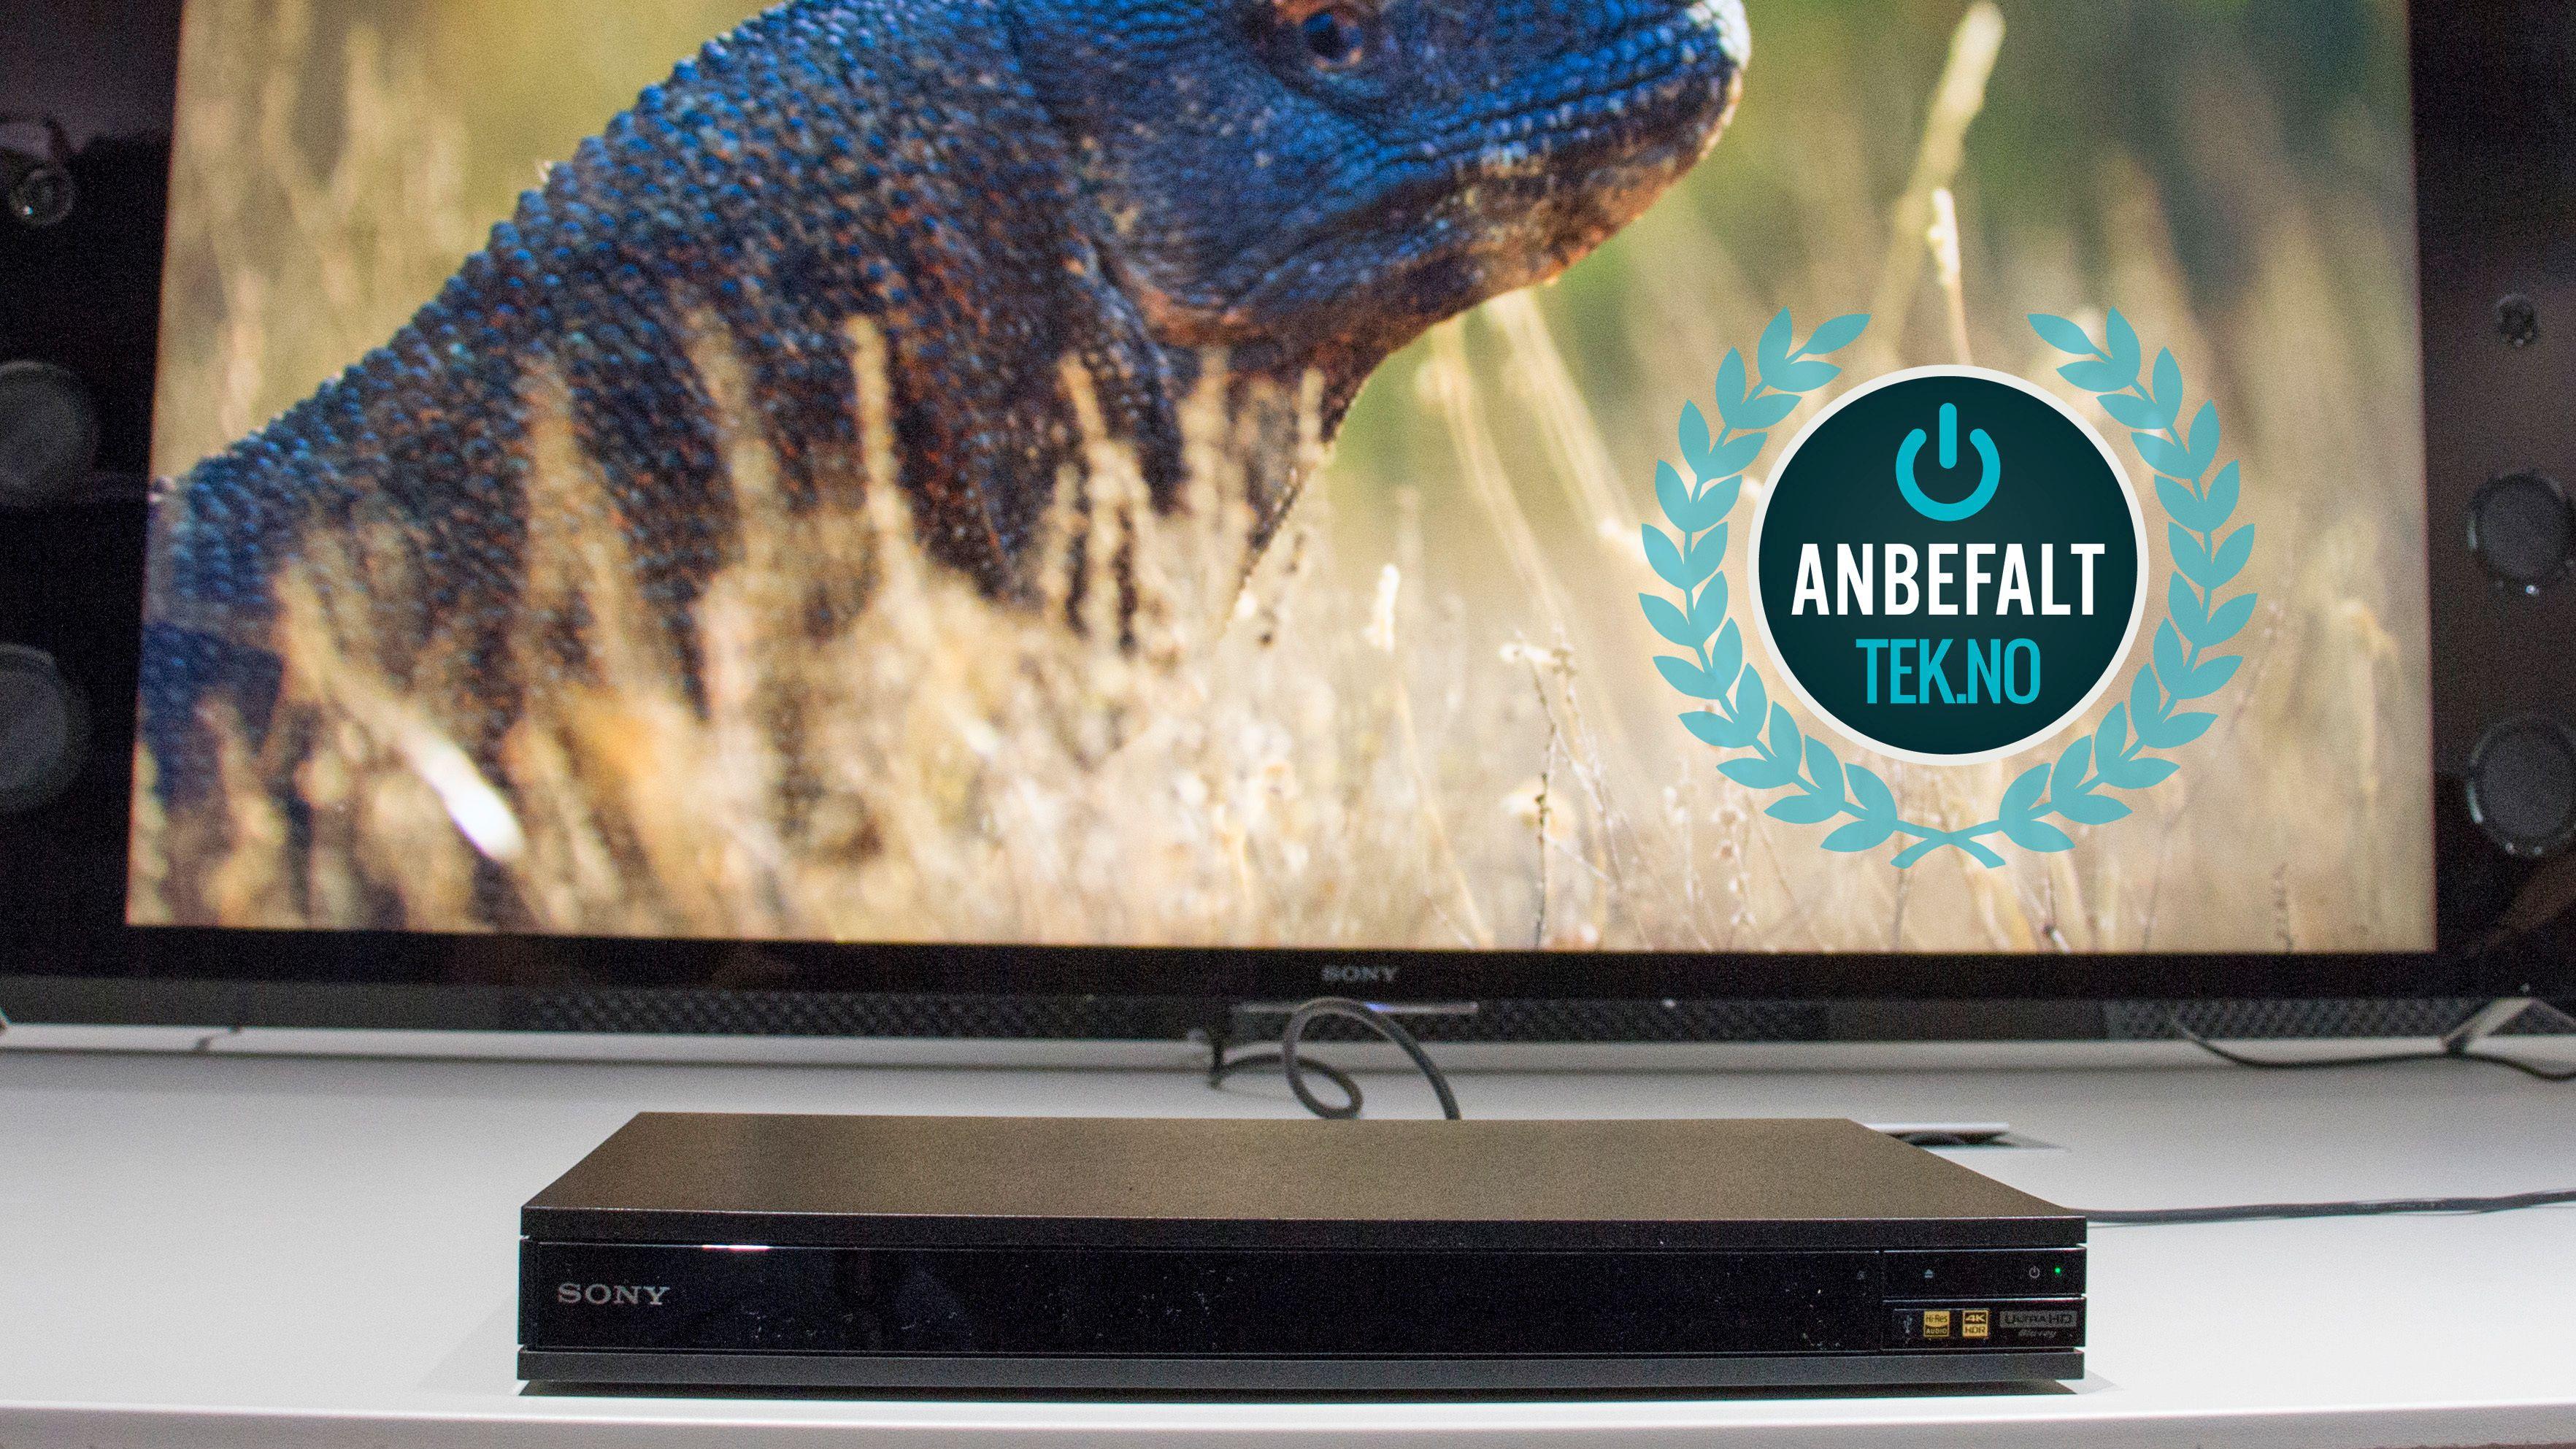 Sonys nye UHD Blu-ray er et anbefalt produkt